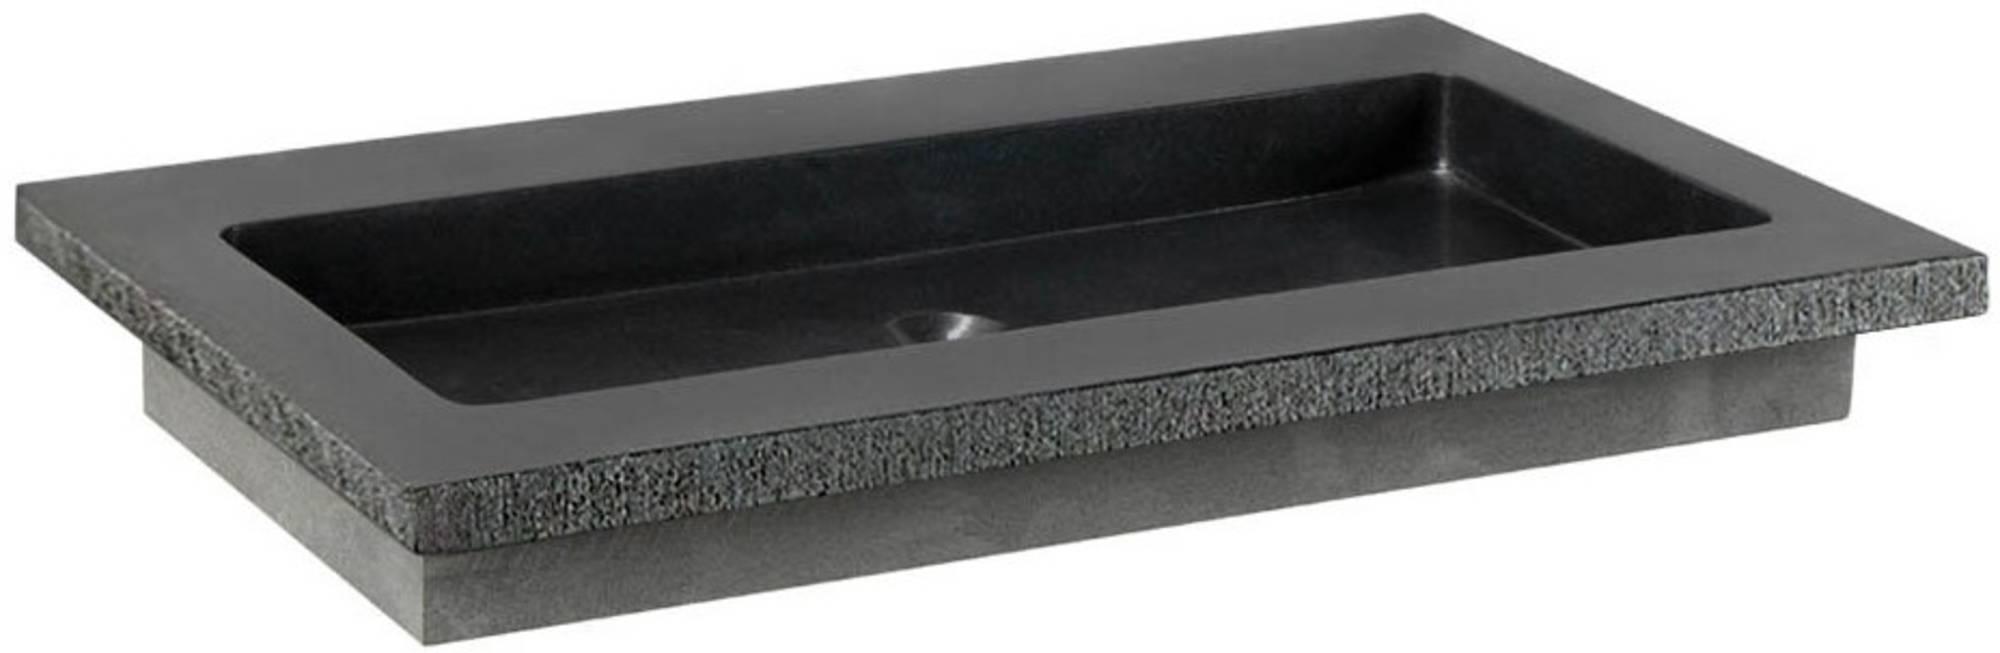 Ben Naturno Wastafel Graniet Gezoet Gefrijnd 80,5x51,5x3 cm zonder Krg. Zwart